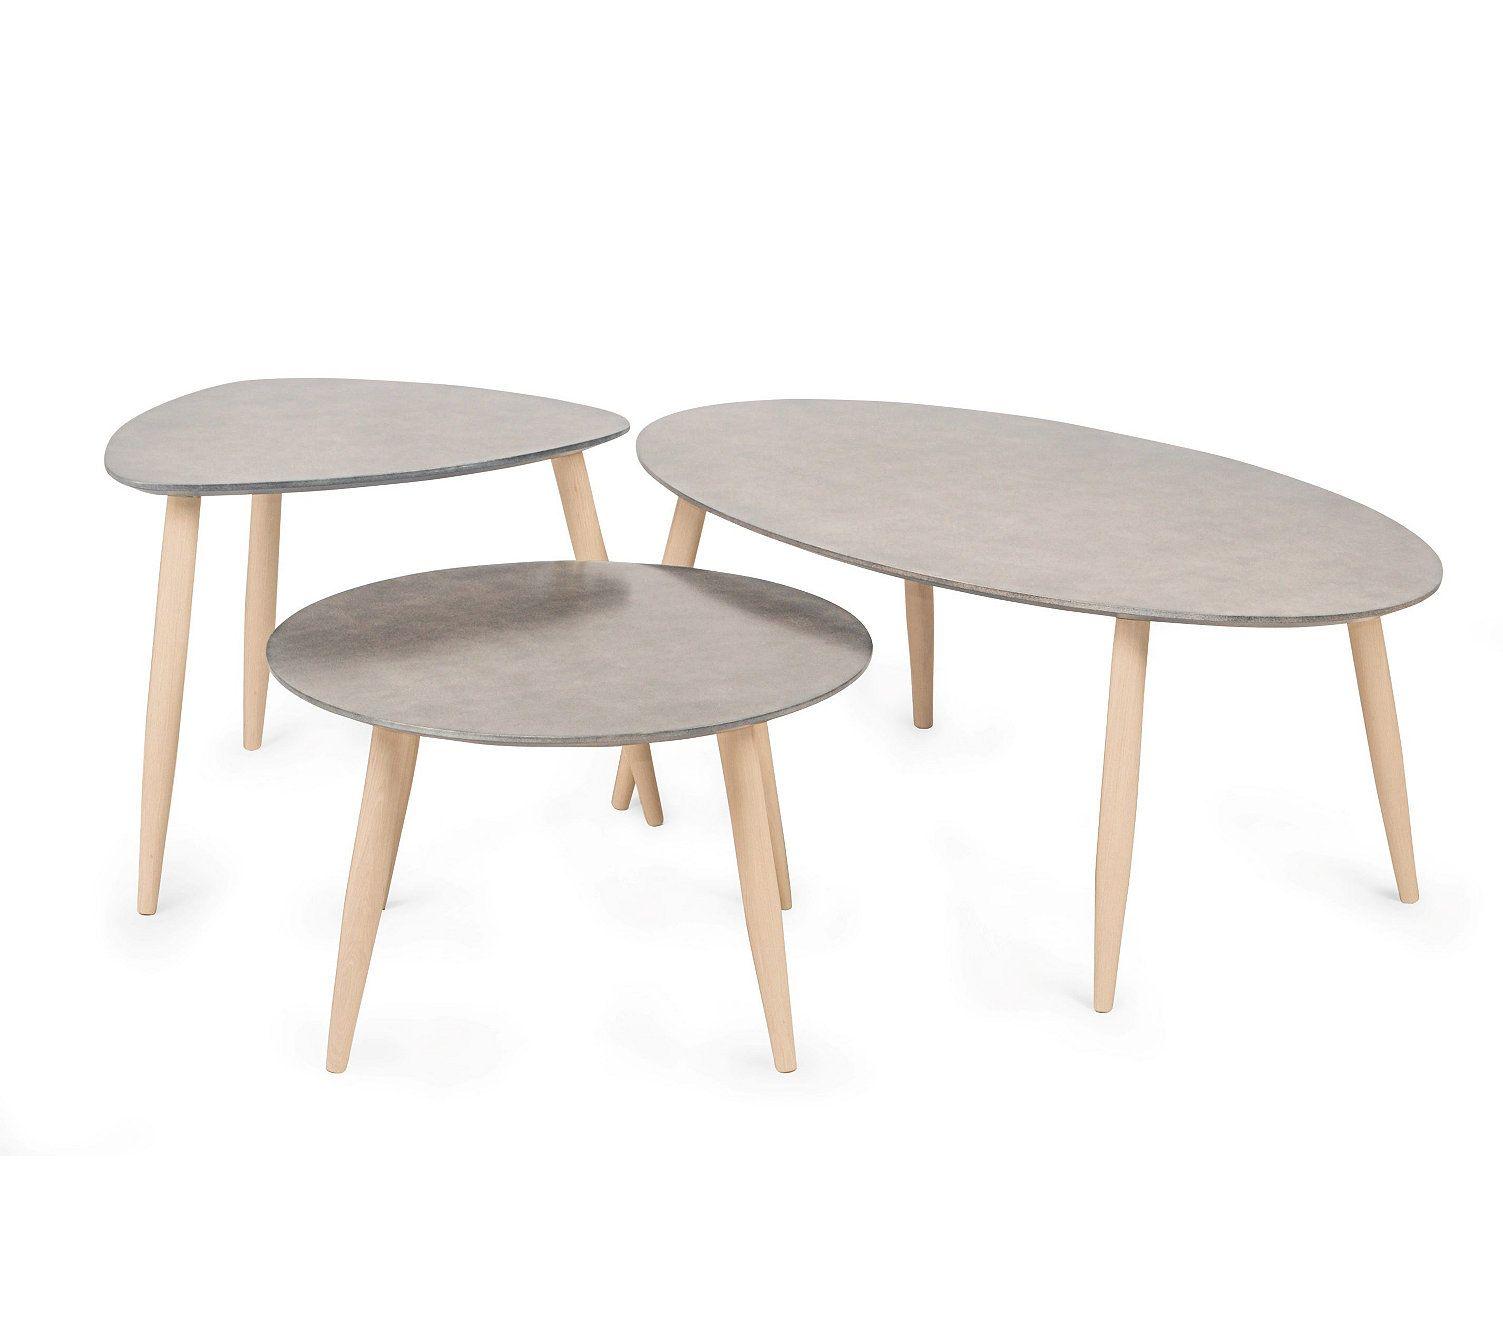 Table Basse Scandinave Manon Triangle Beton Table Basse Table Basse Marbre Meuble Table Basse